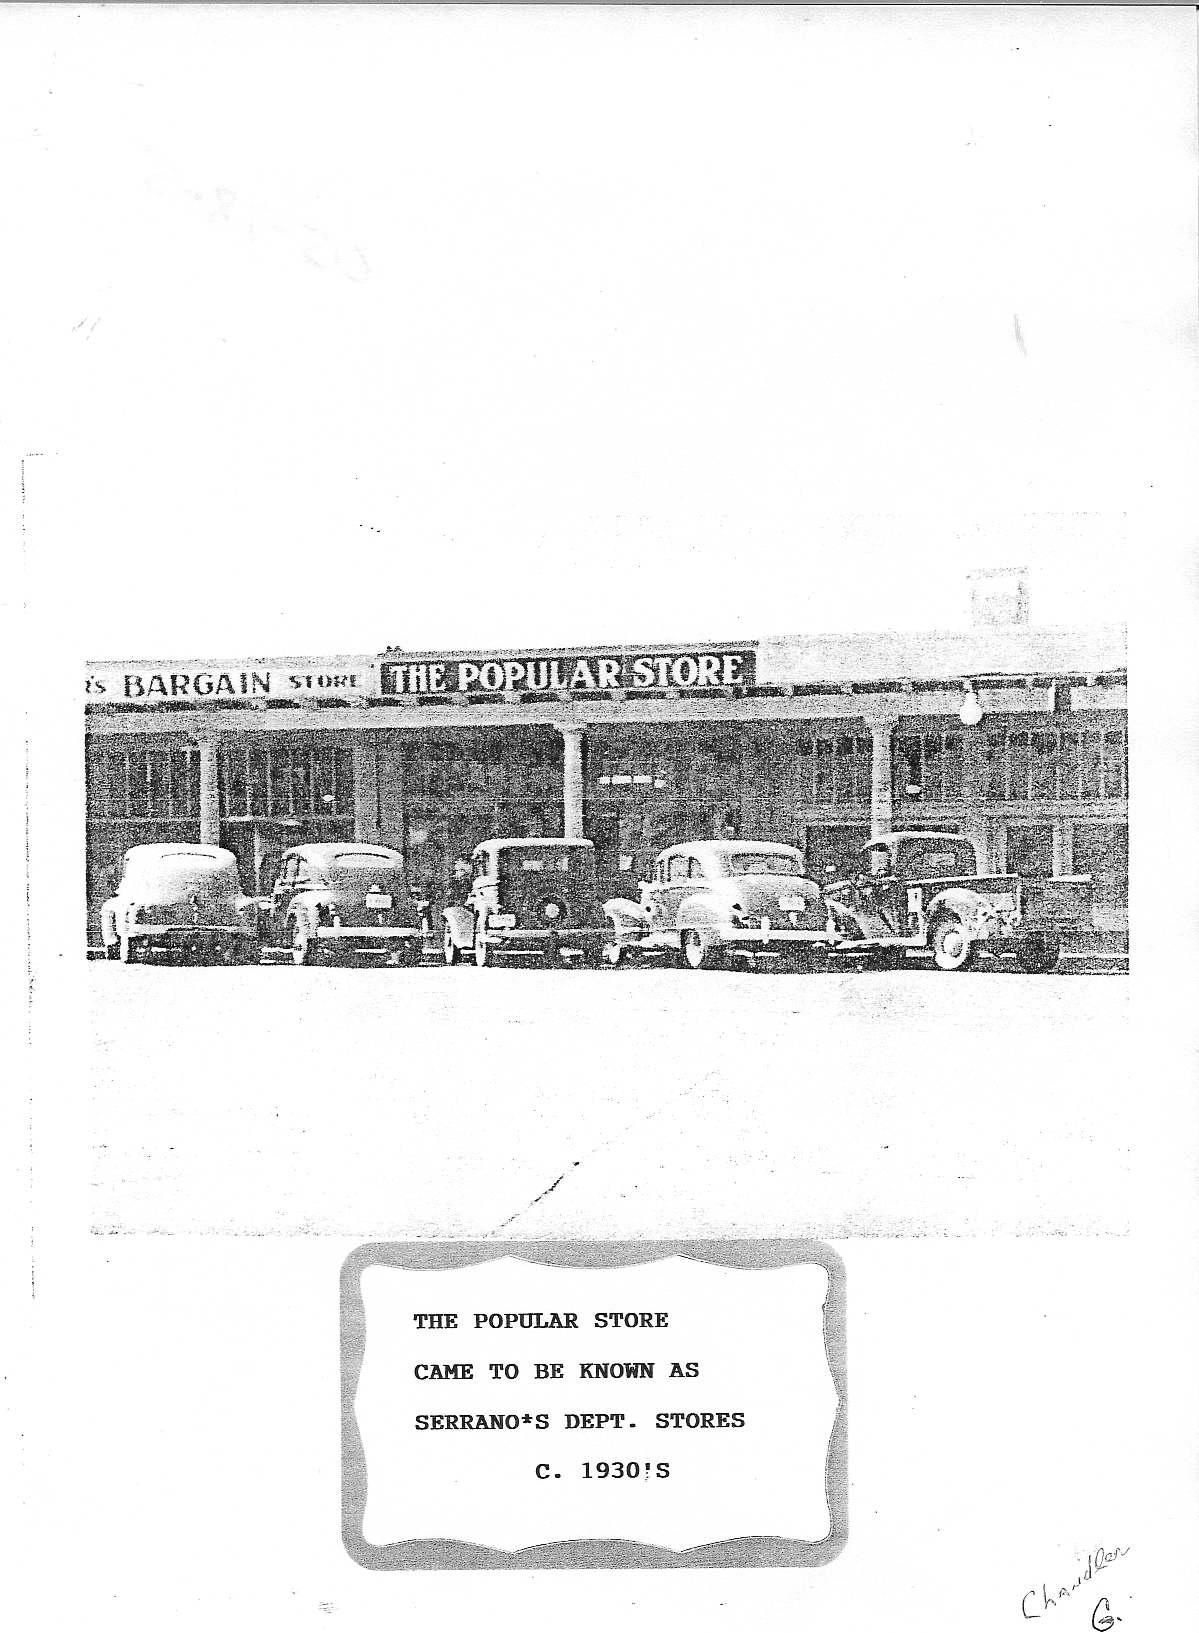 Serrano's Popular Store, 1930